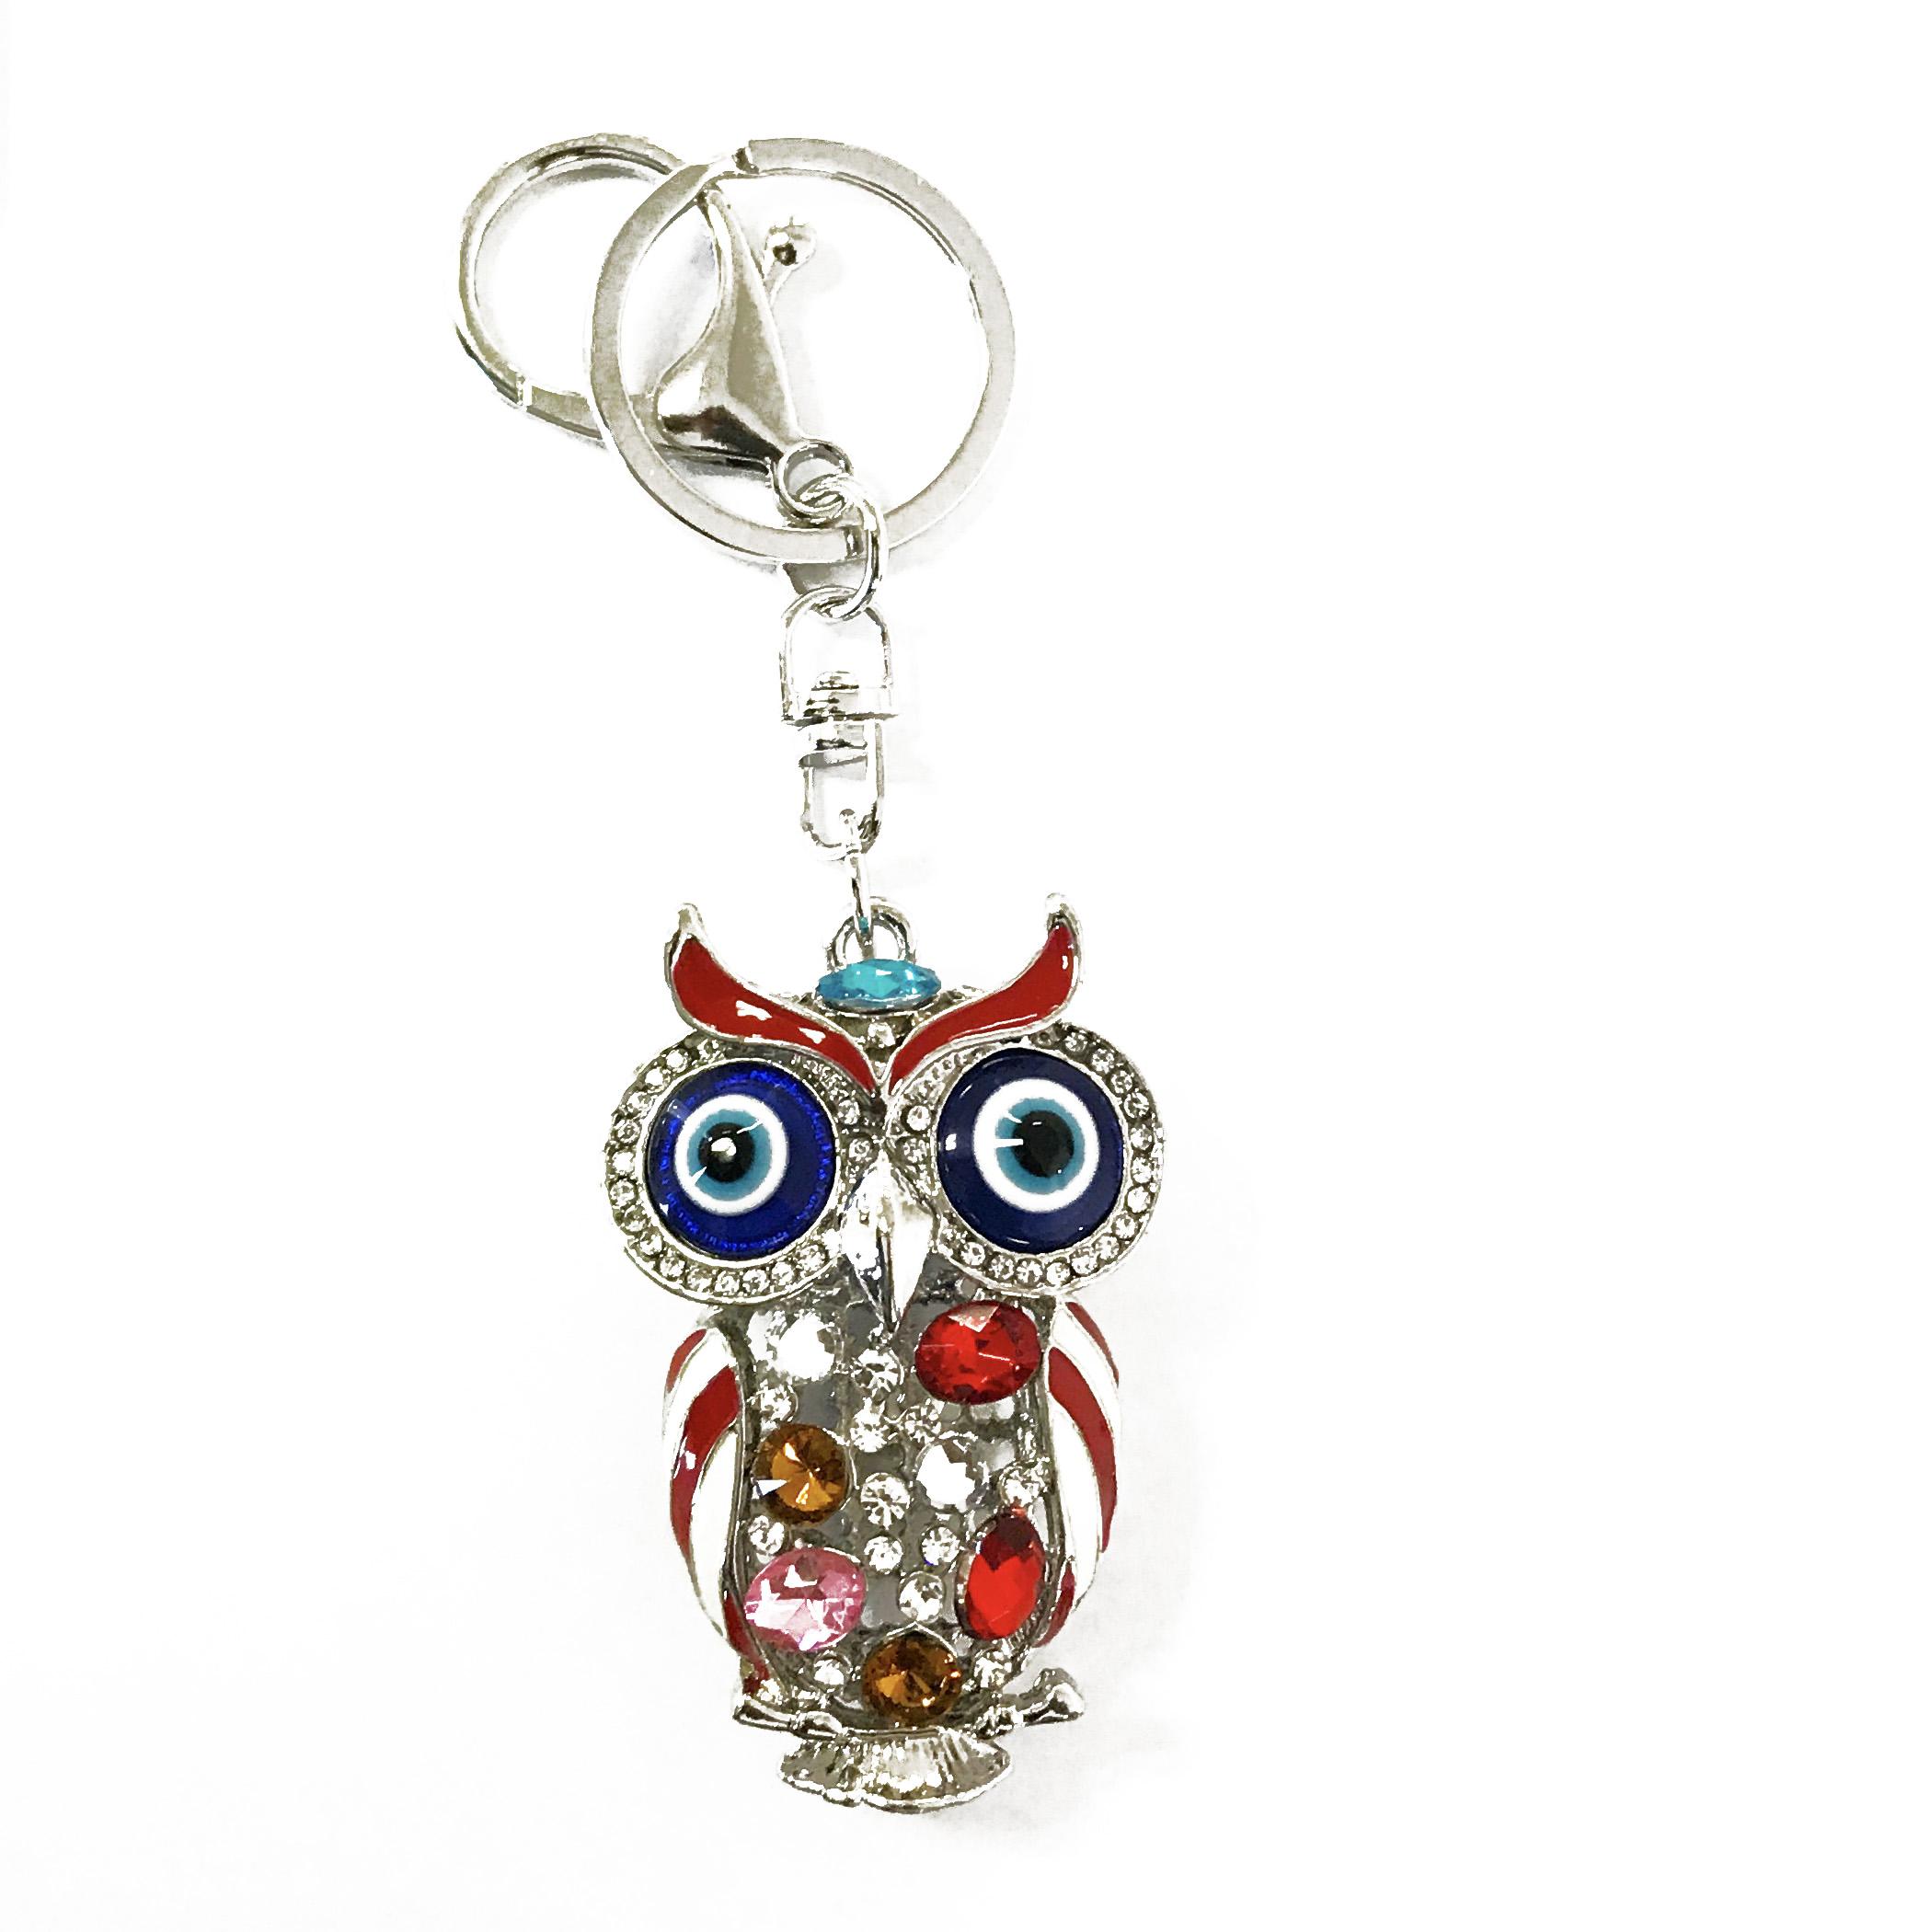 owl key chain and bag charm